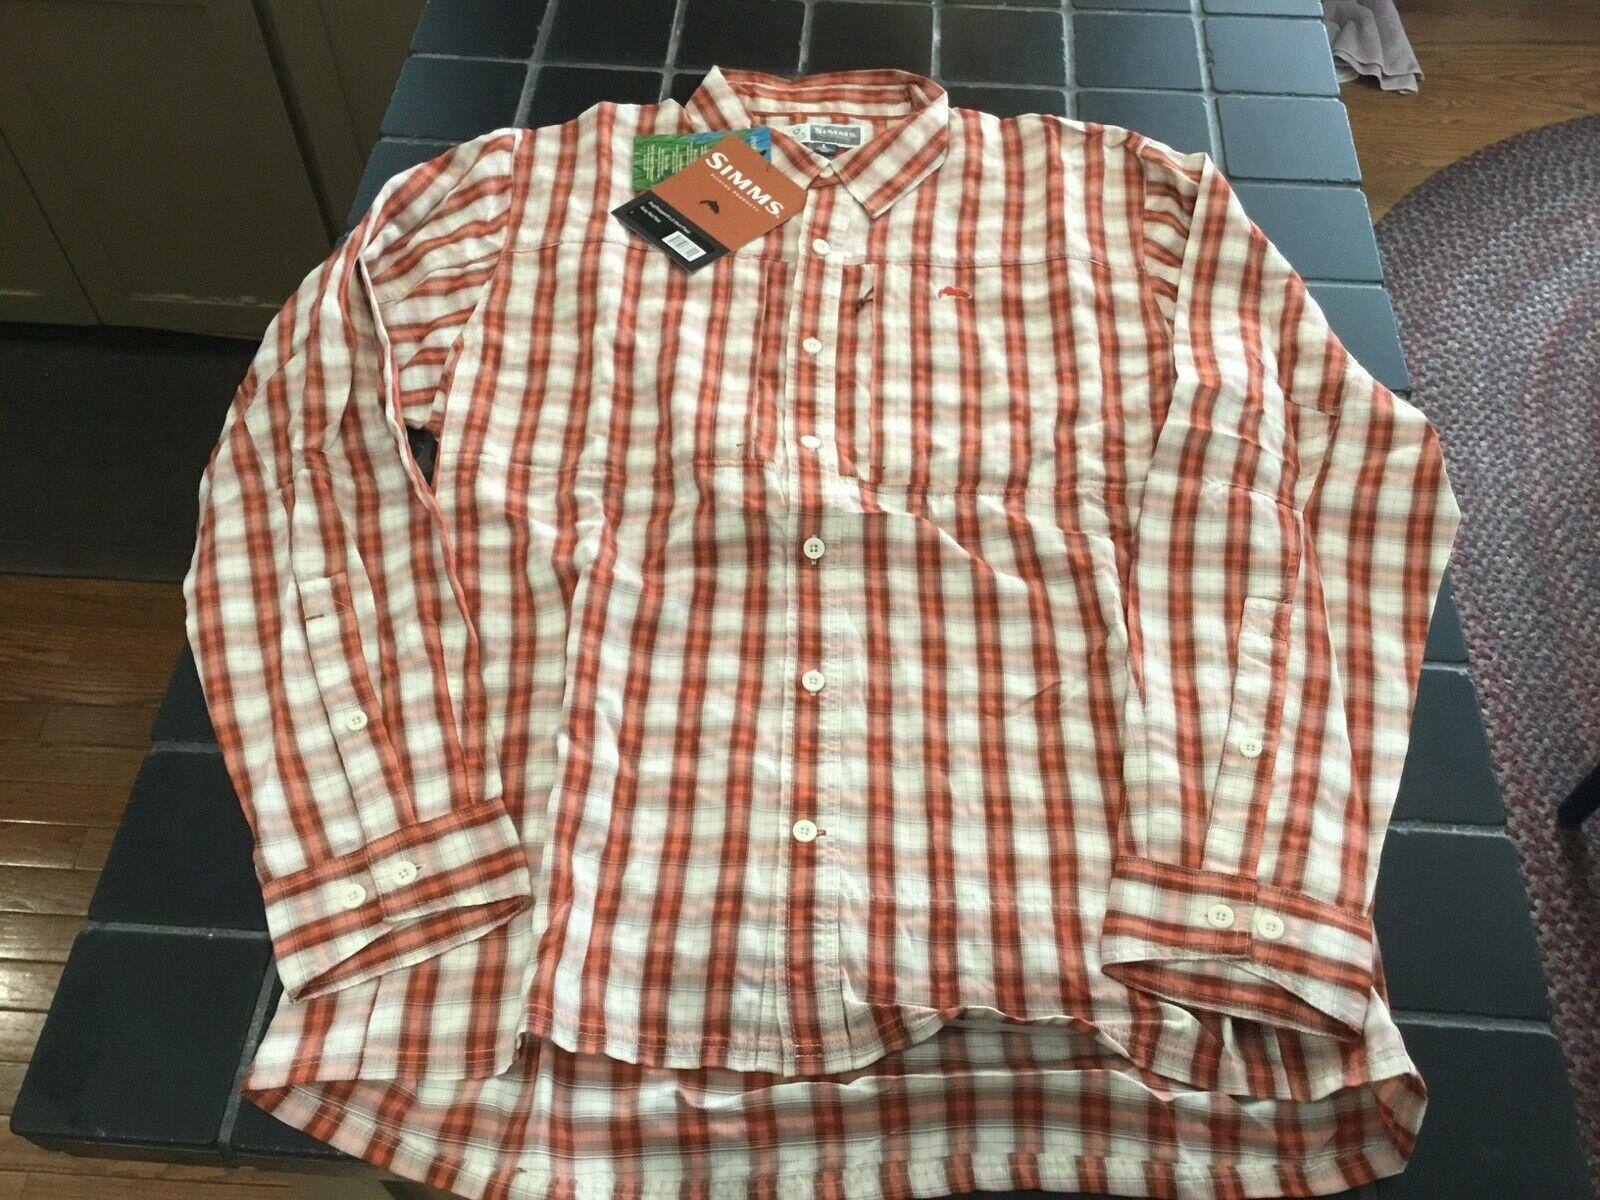 Nuevo Con Etiquetas Camisa Manga Larga bugstopper Simms Fishing,  Talla L, camisa a cuadros roja Bug prueba oxidado  venta